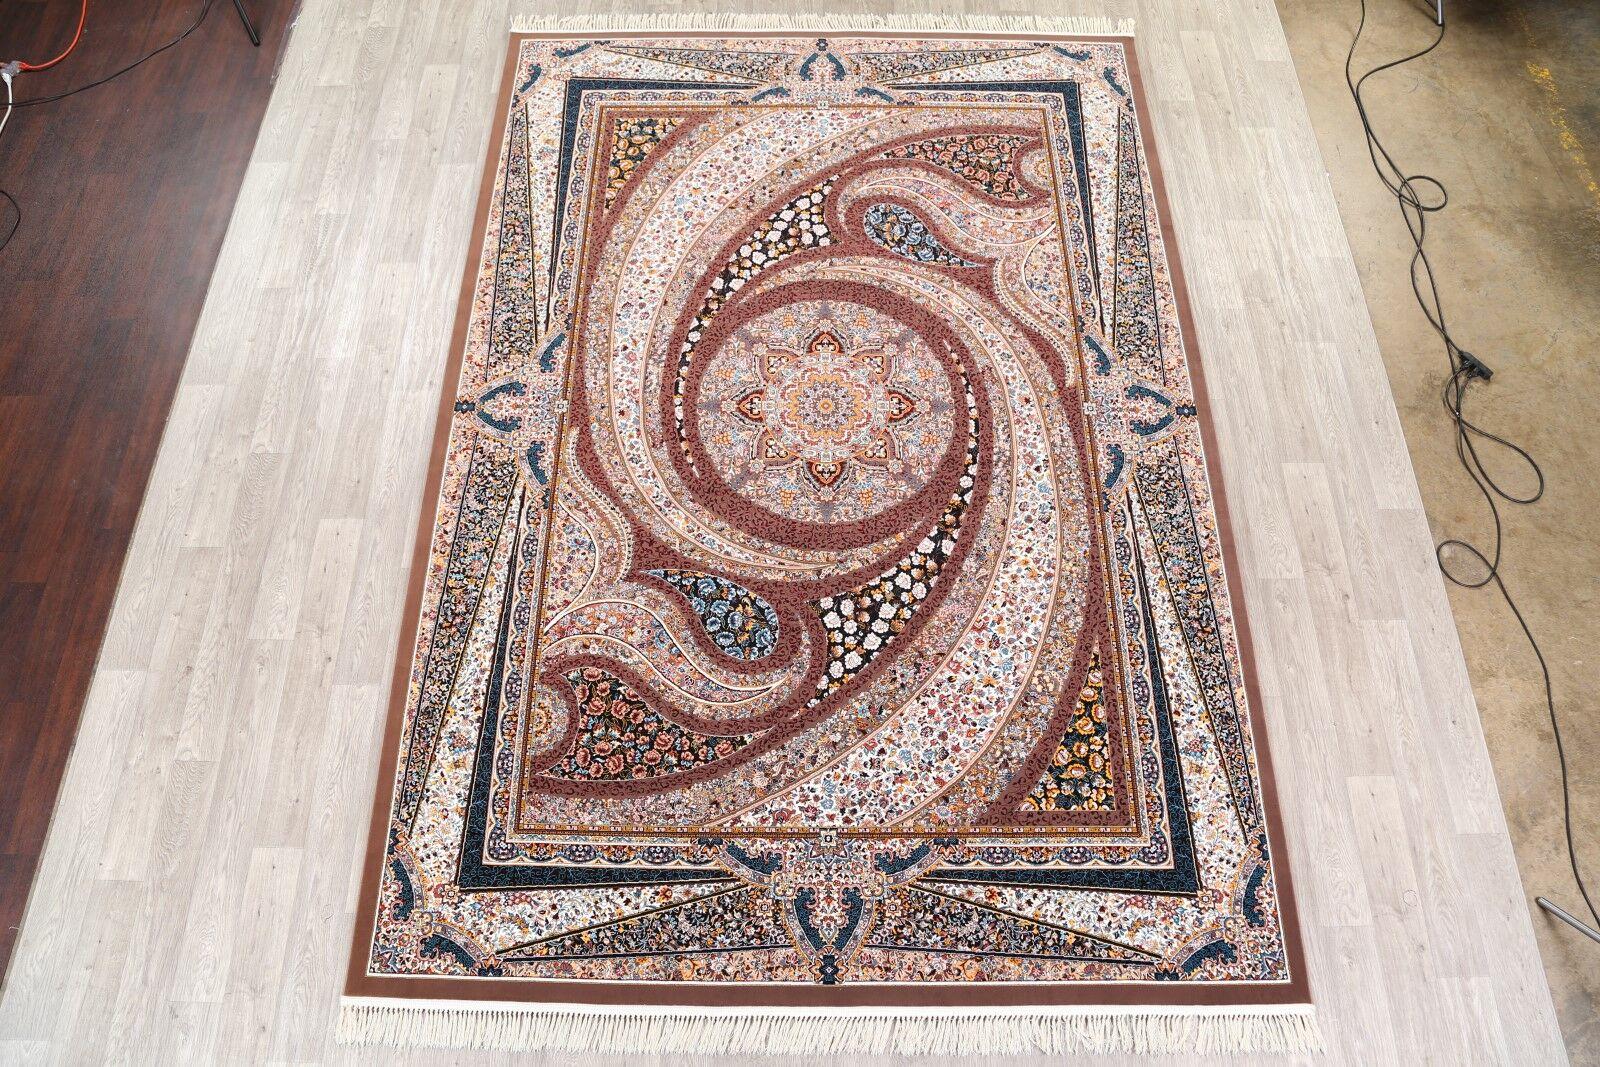 Mayne Soft Plush Geometric Tabriz Persian Brown/Ivory/Blue Area Rug